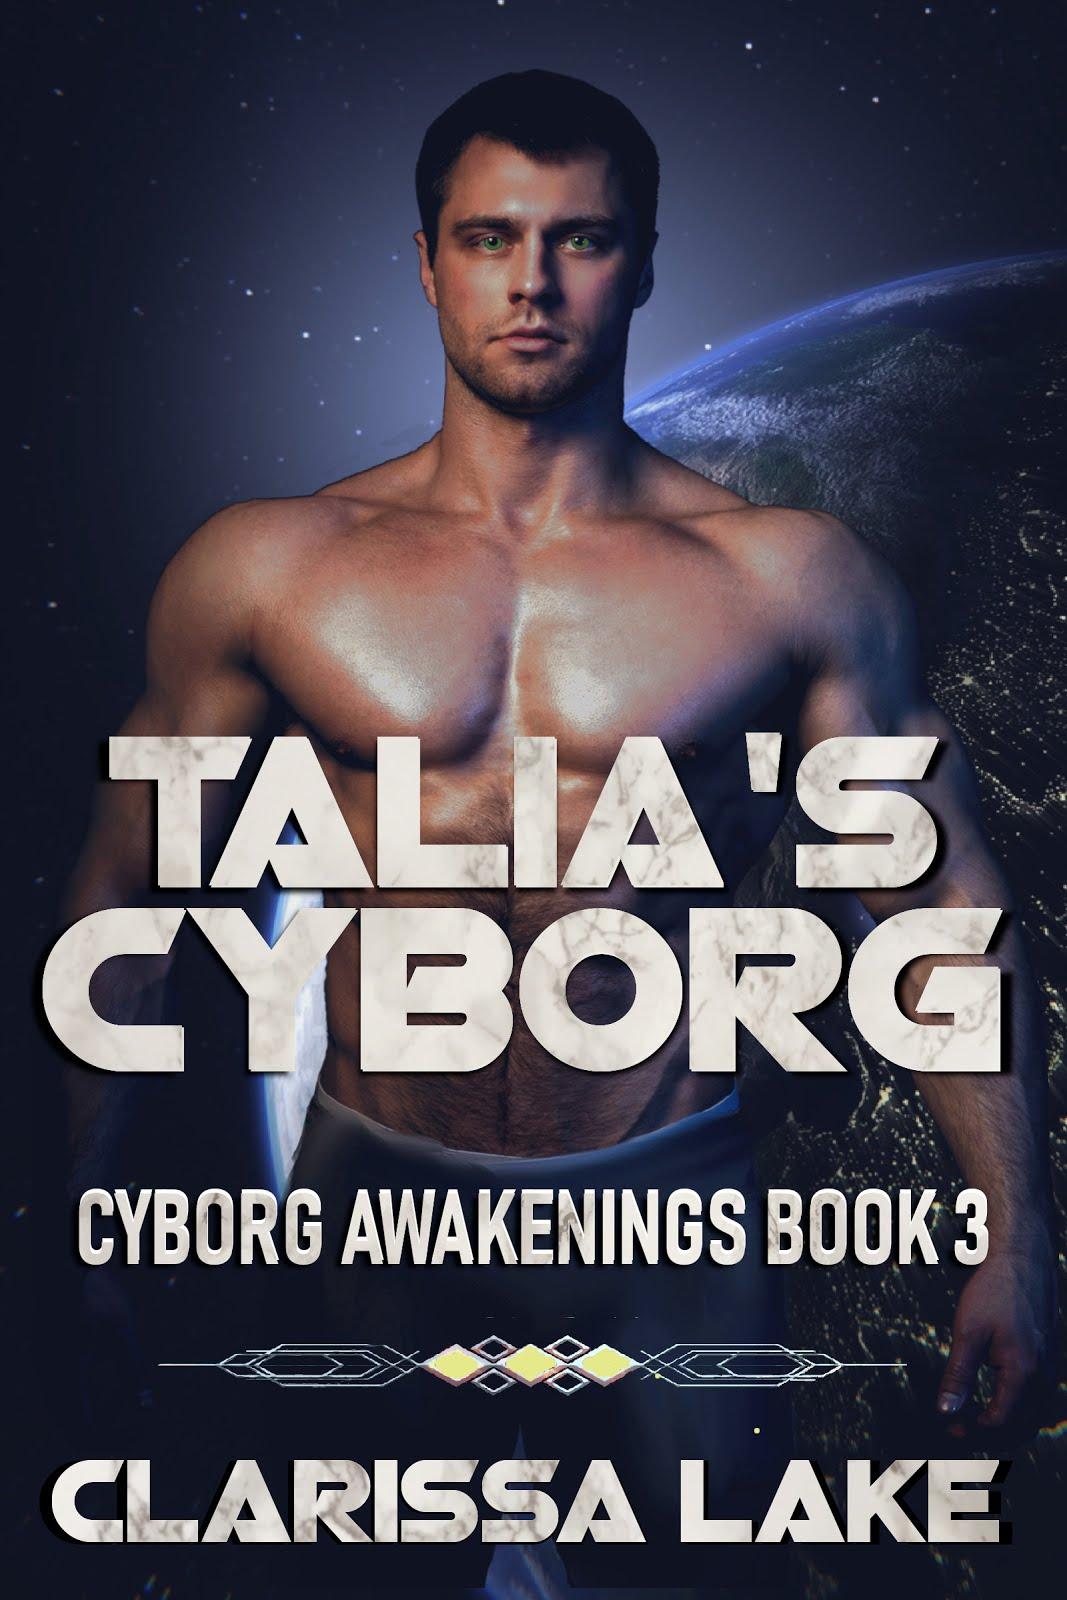 Talia's Cyborg